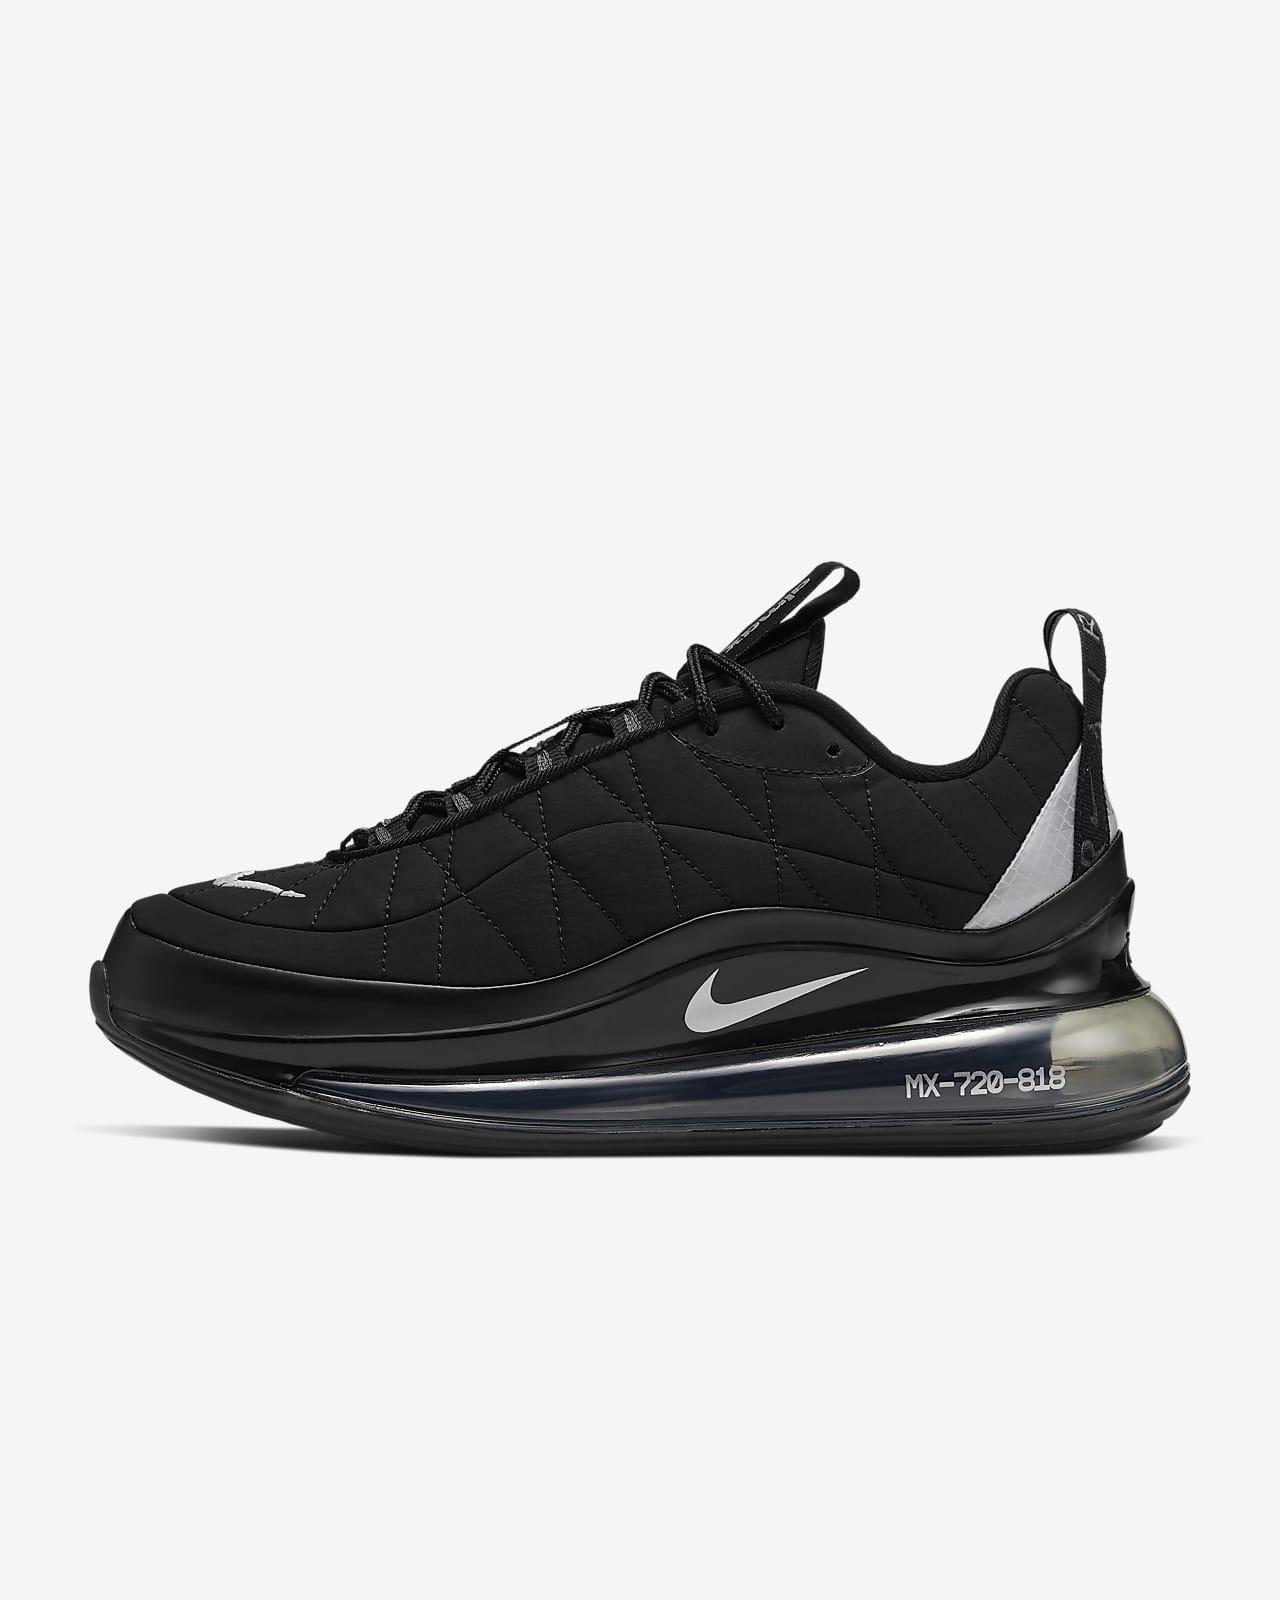 Chaussure Nike MX 720 818 pour Femme